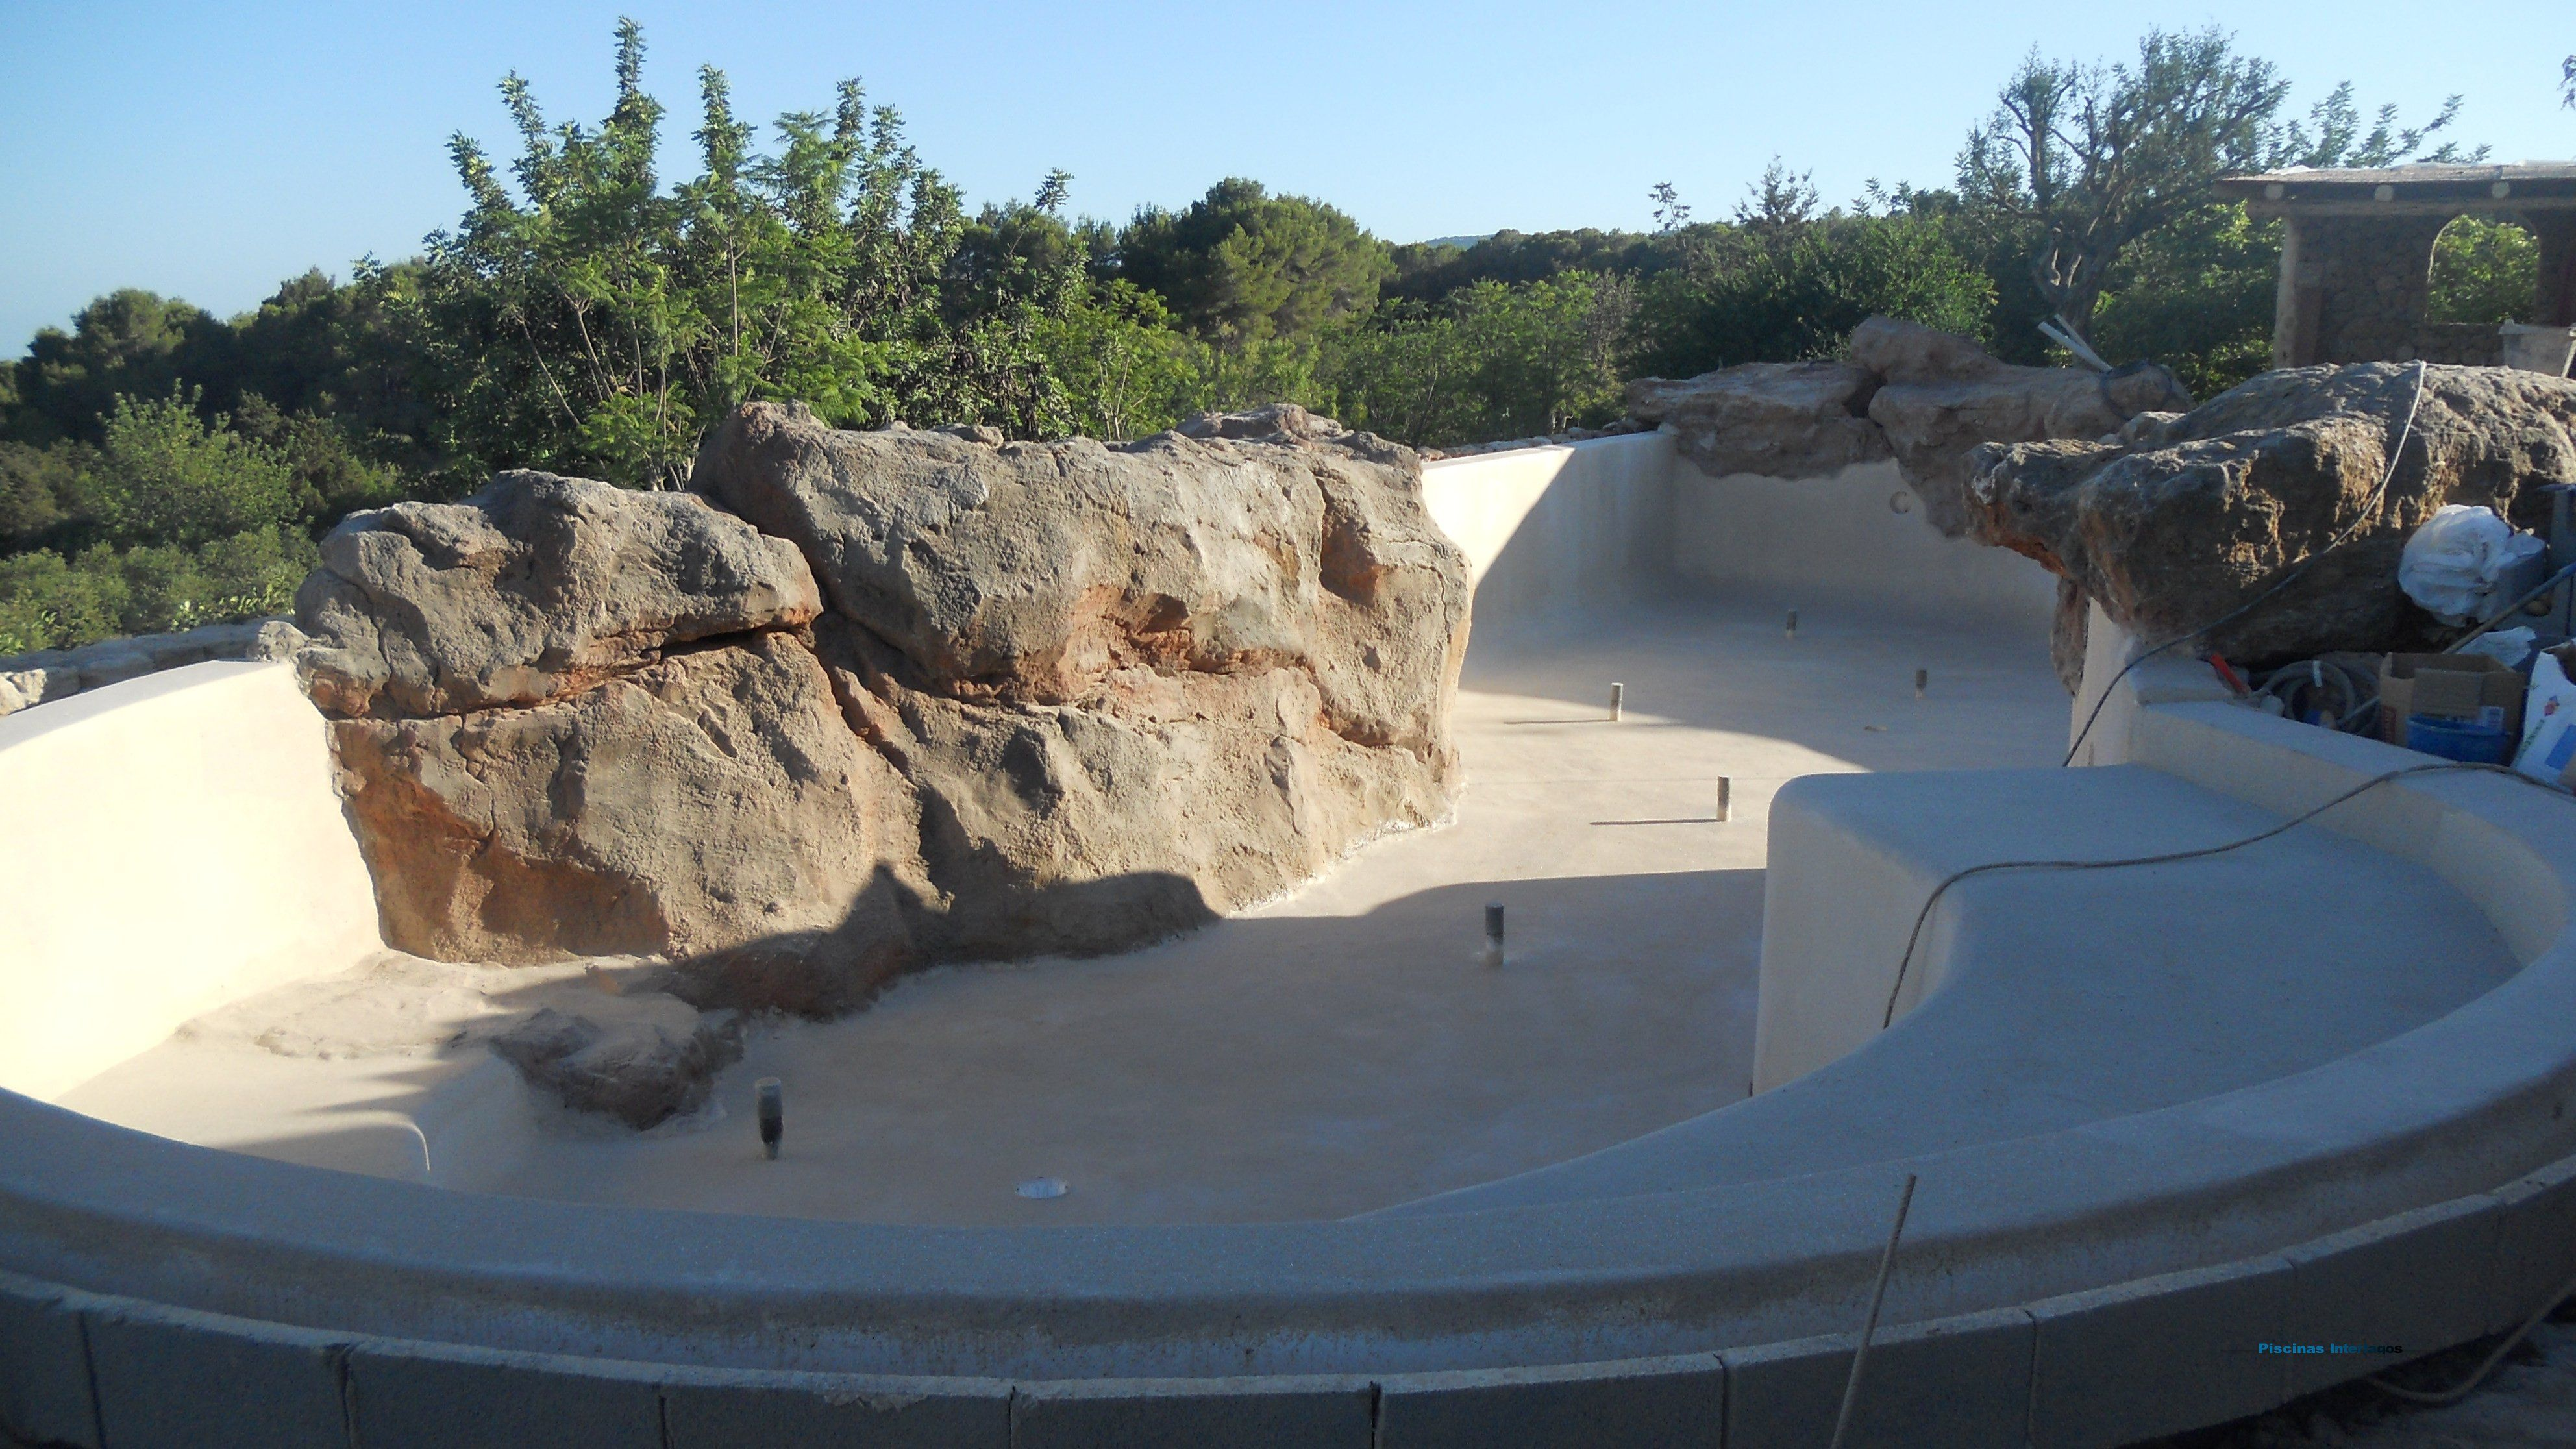 Per metro piscina de arena en construcci n piscinas - Construccion de piscinas de arena ...